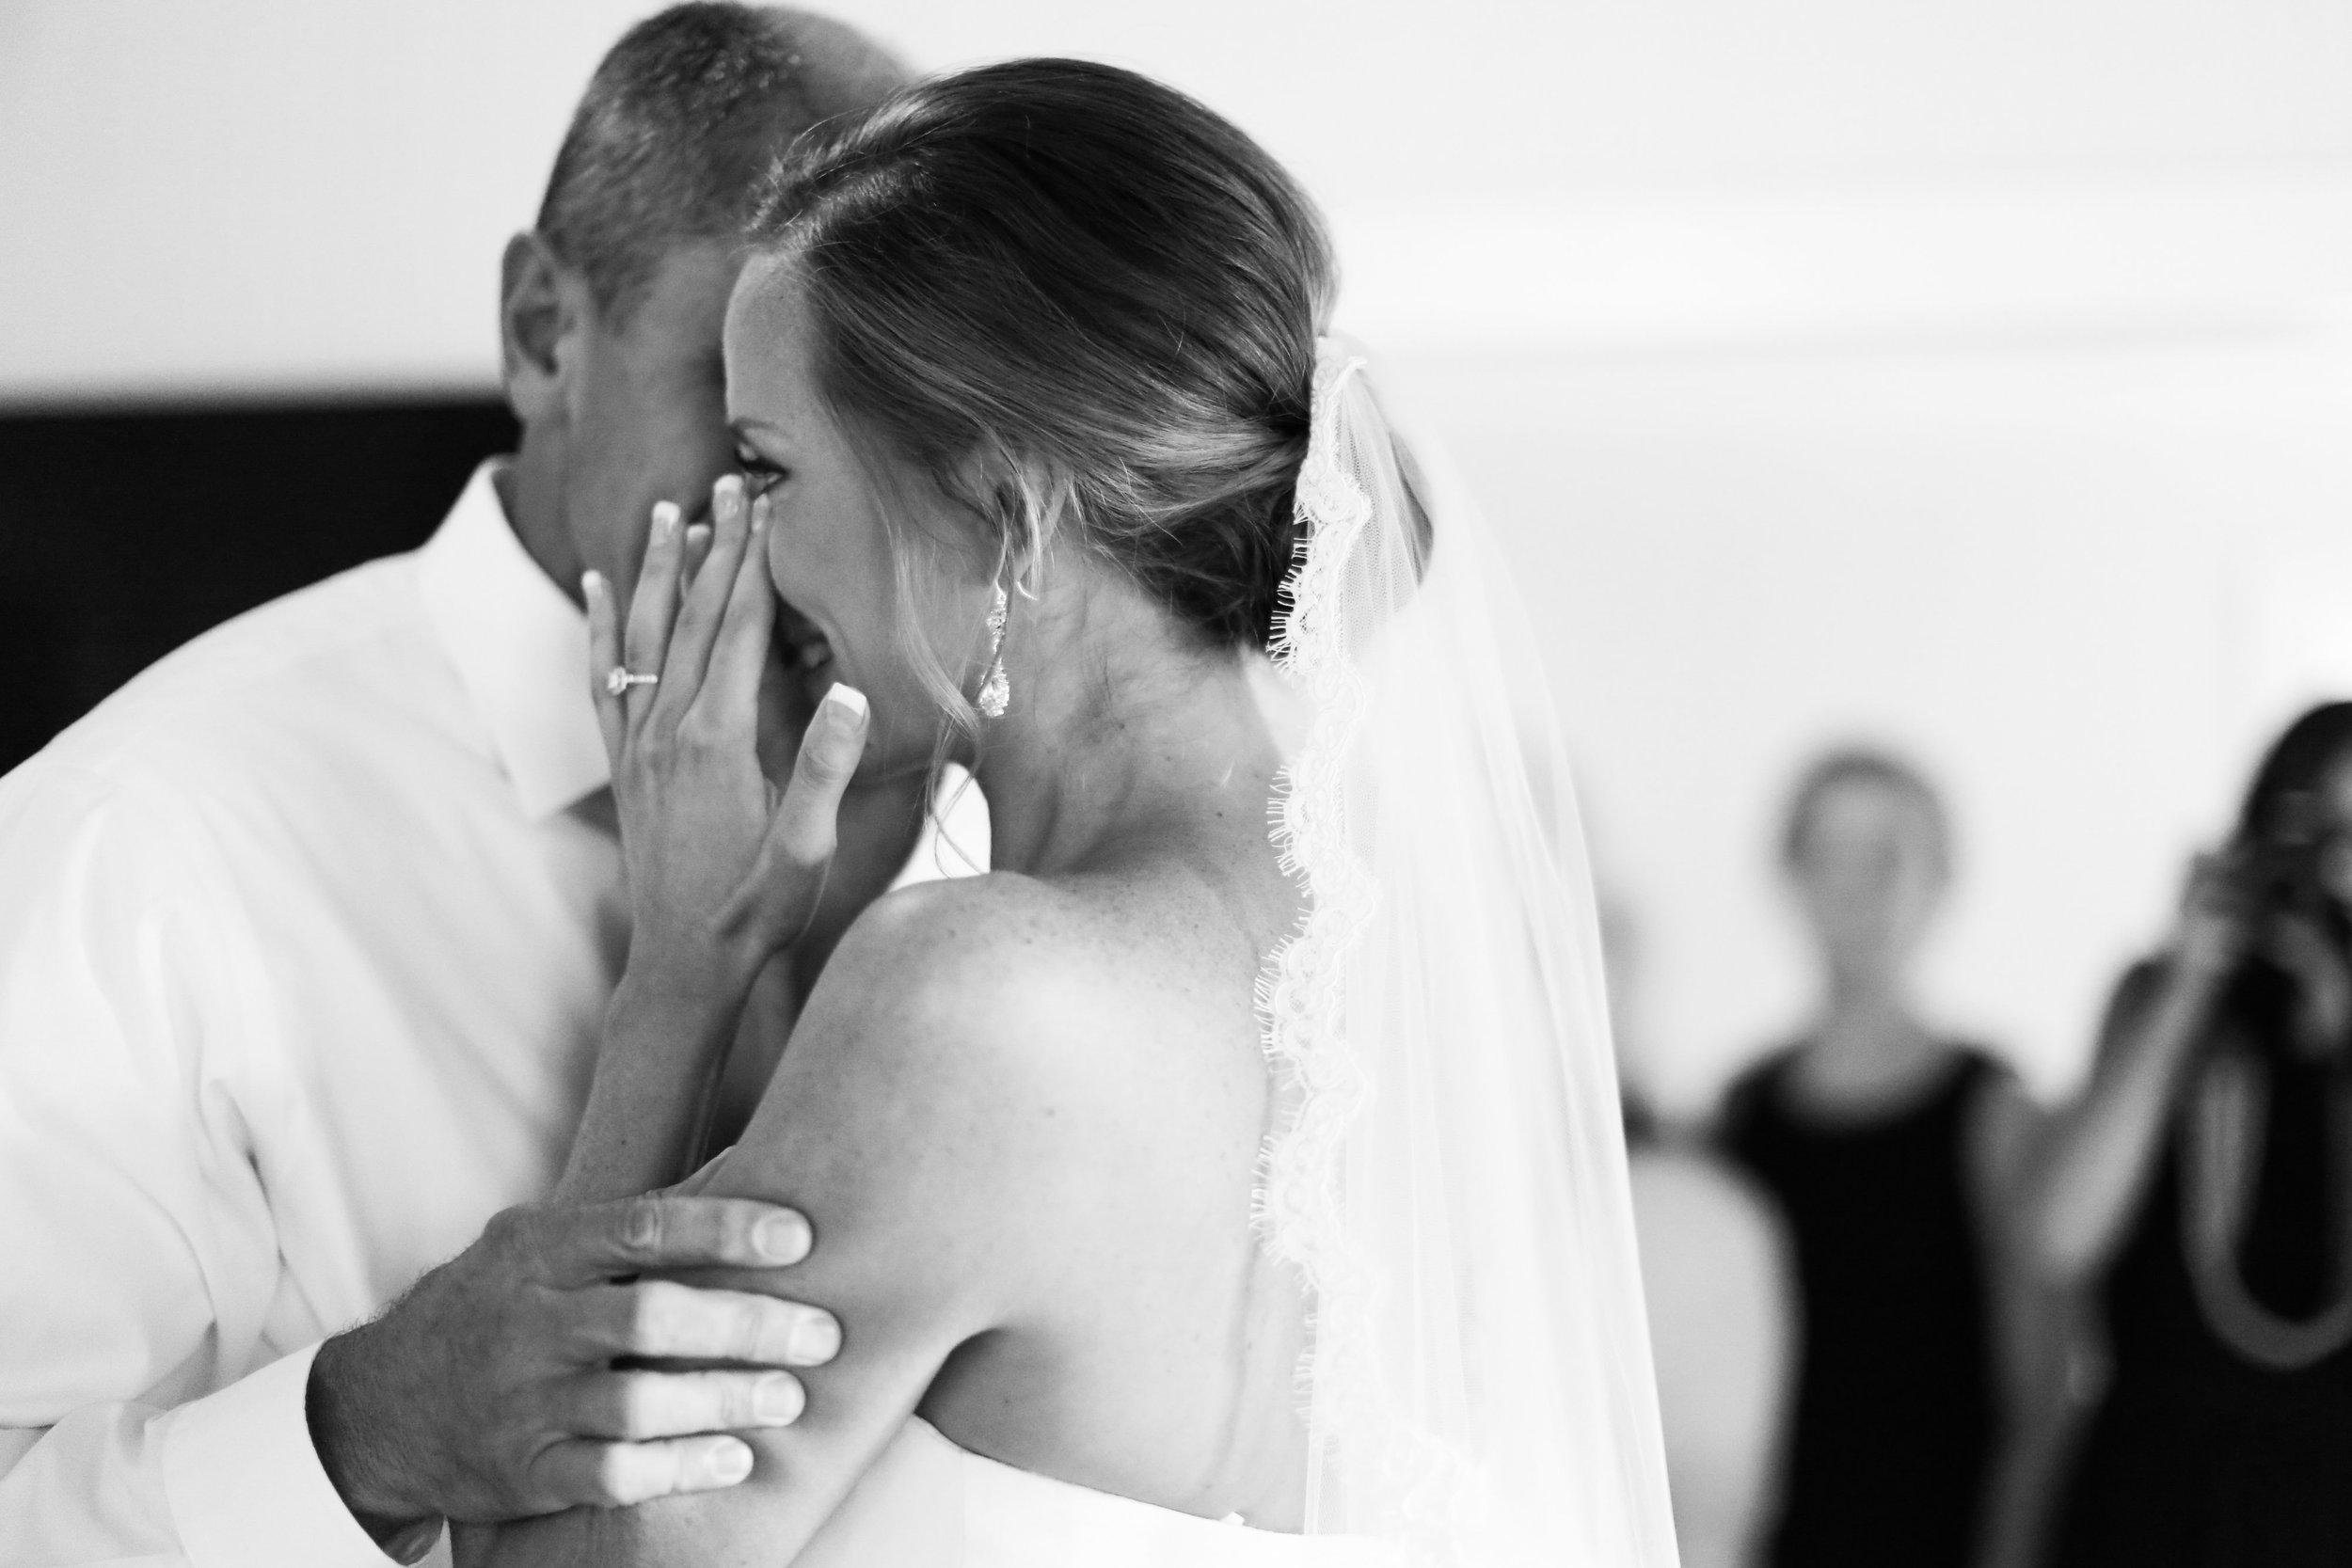 finnegan-photography-ivory-and-beau-bridal-boutique-nicole-miller-dakota-jaclyn-jordan-anne-veil-savannah-bridal-boutique-savannah-wedding-dresses-savannah-weddings-statesboro-wedding-barn-wedding-savannah-bridal-georgia-bridal-boutique-6.jpg